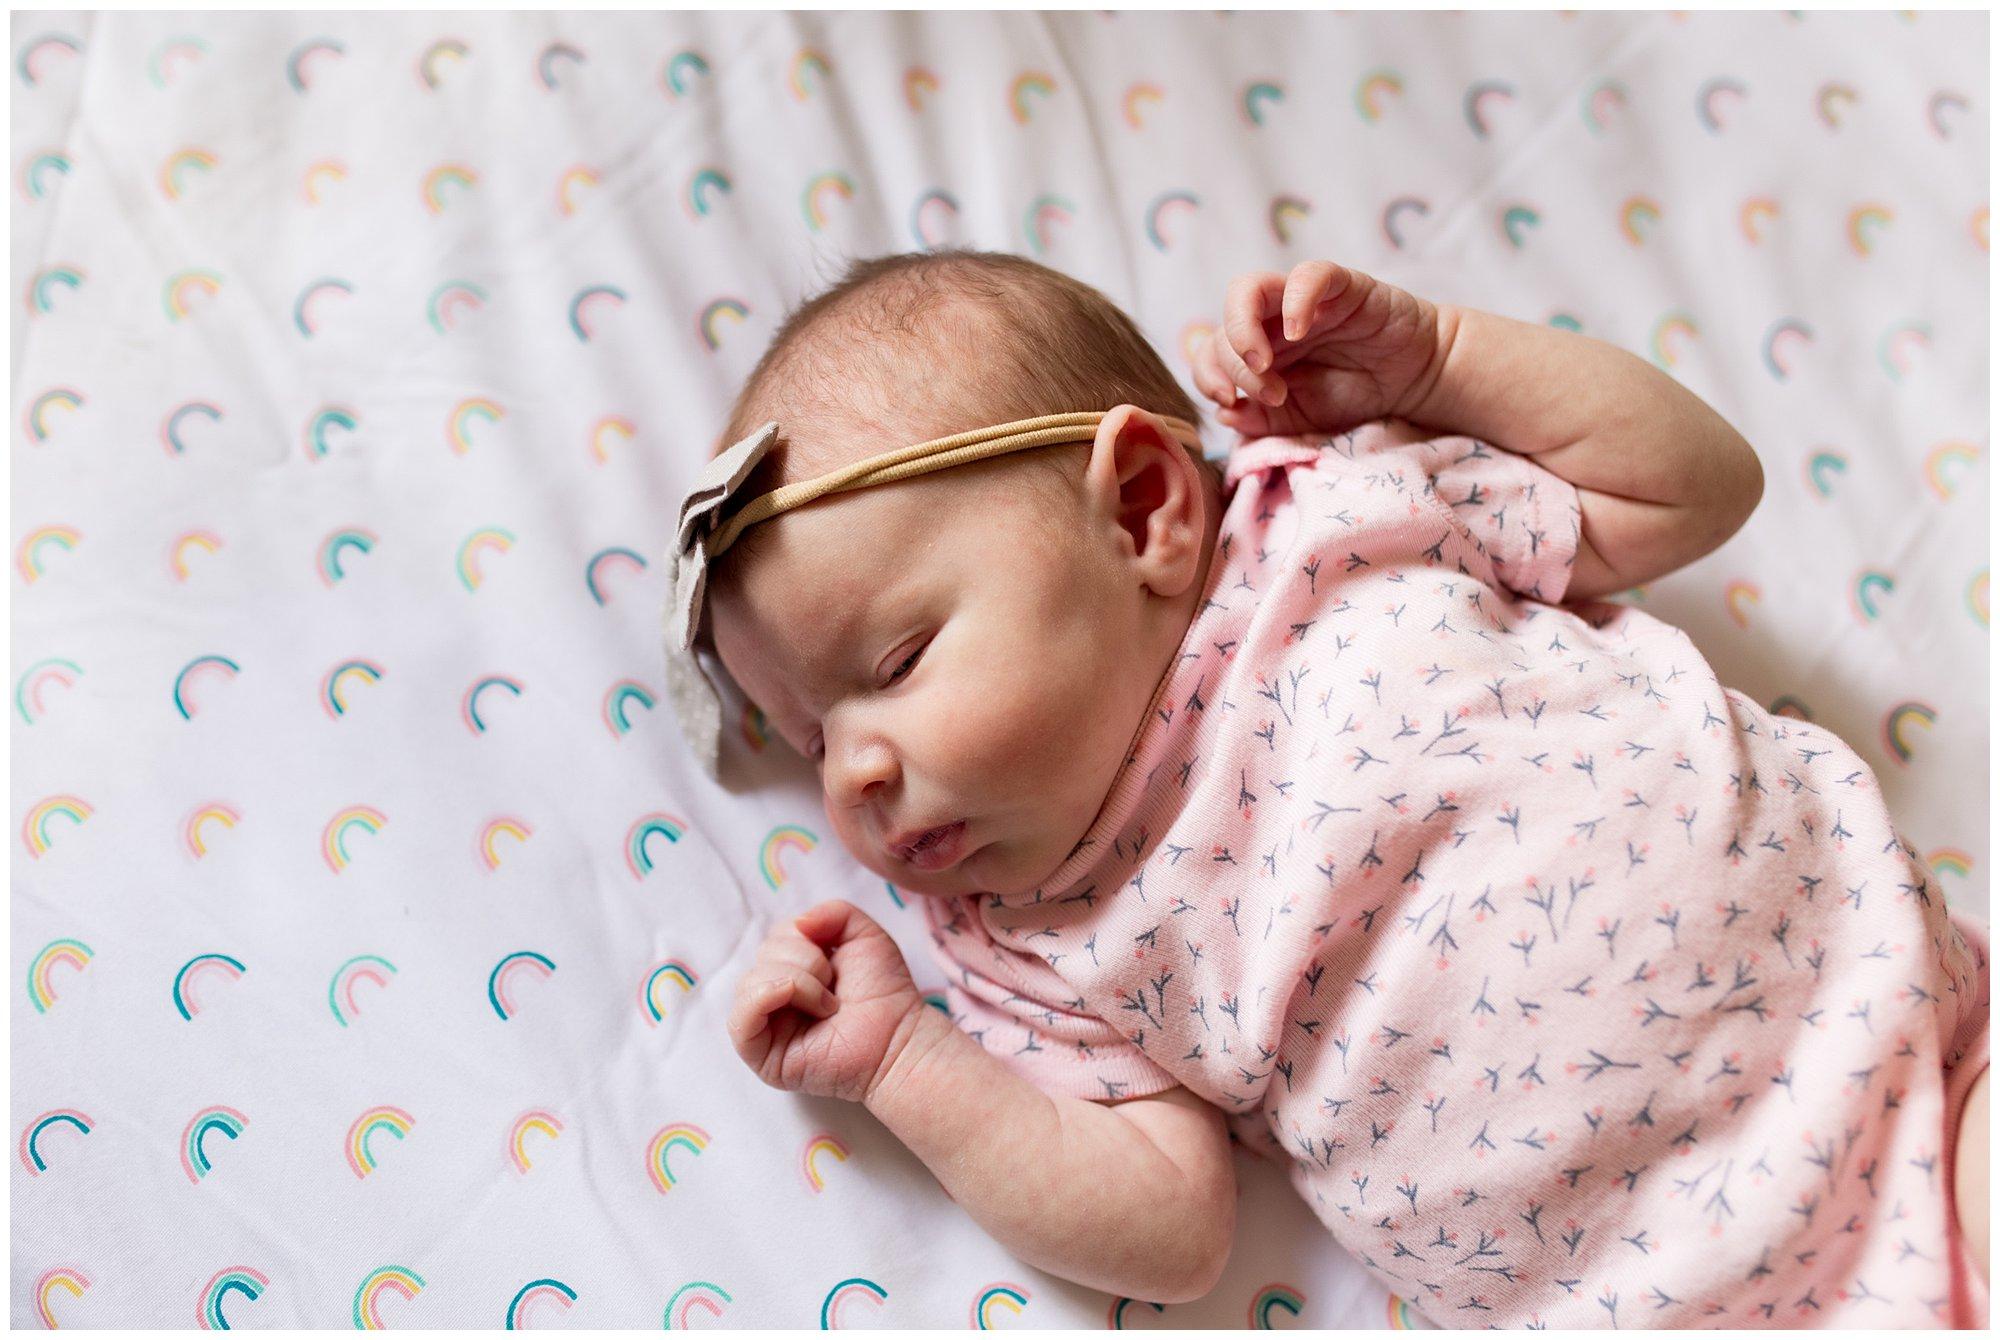 newborn baby sleeping on rainbow crib sheets with bow around head